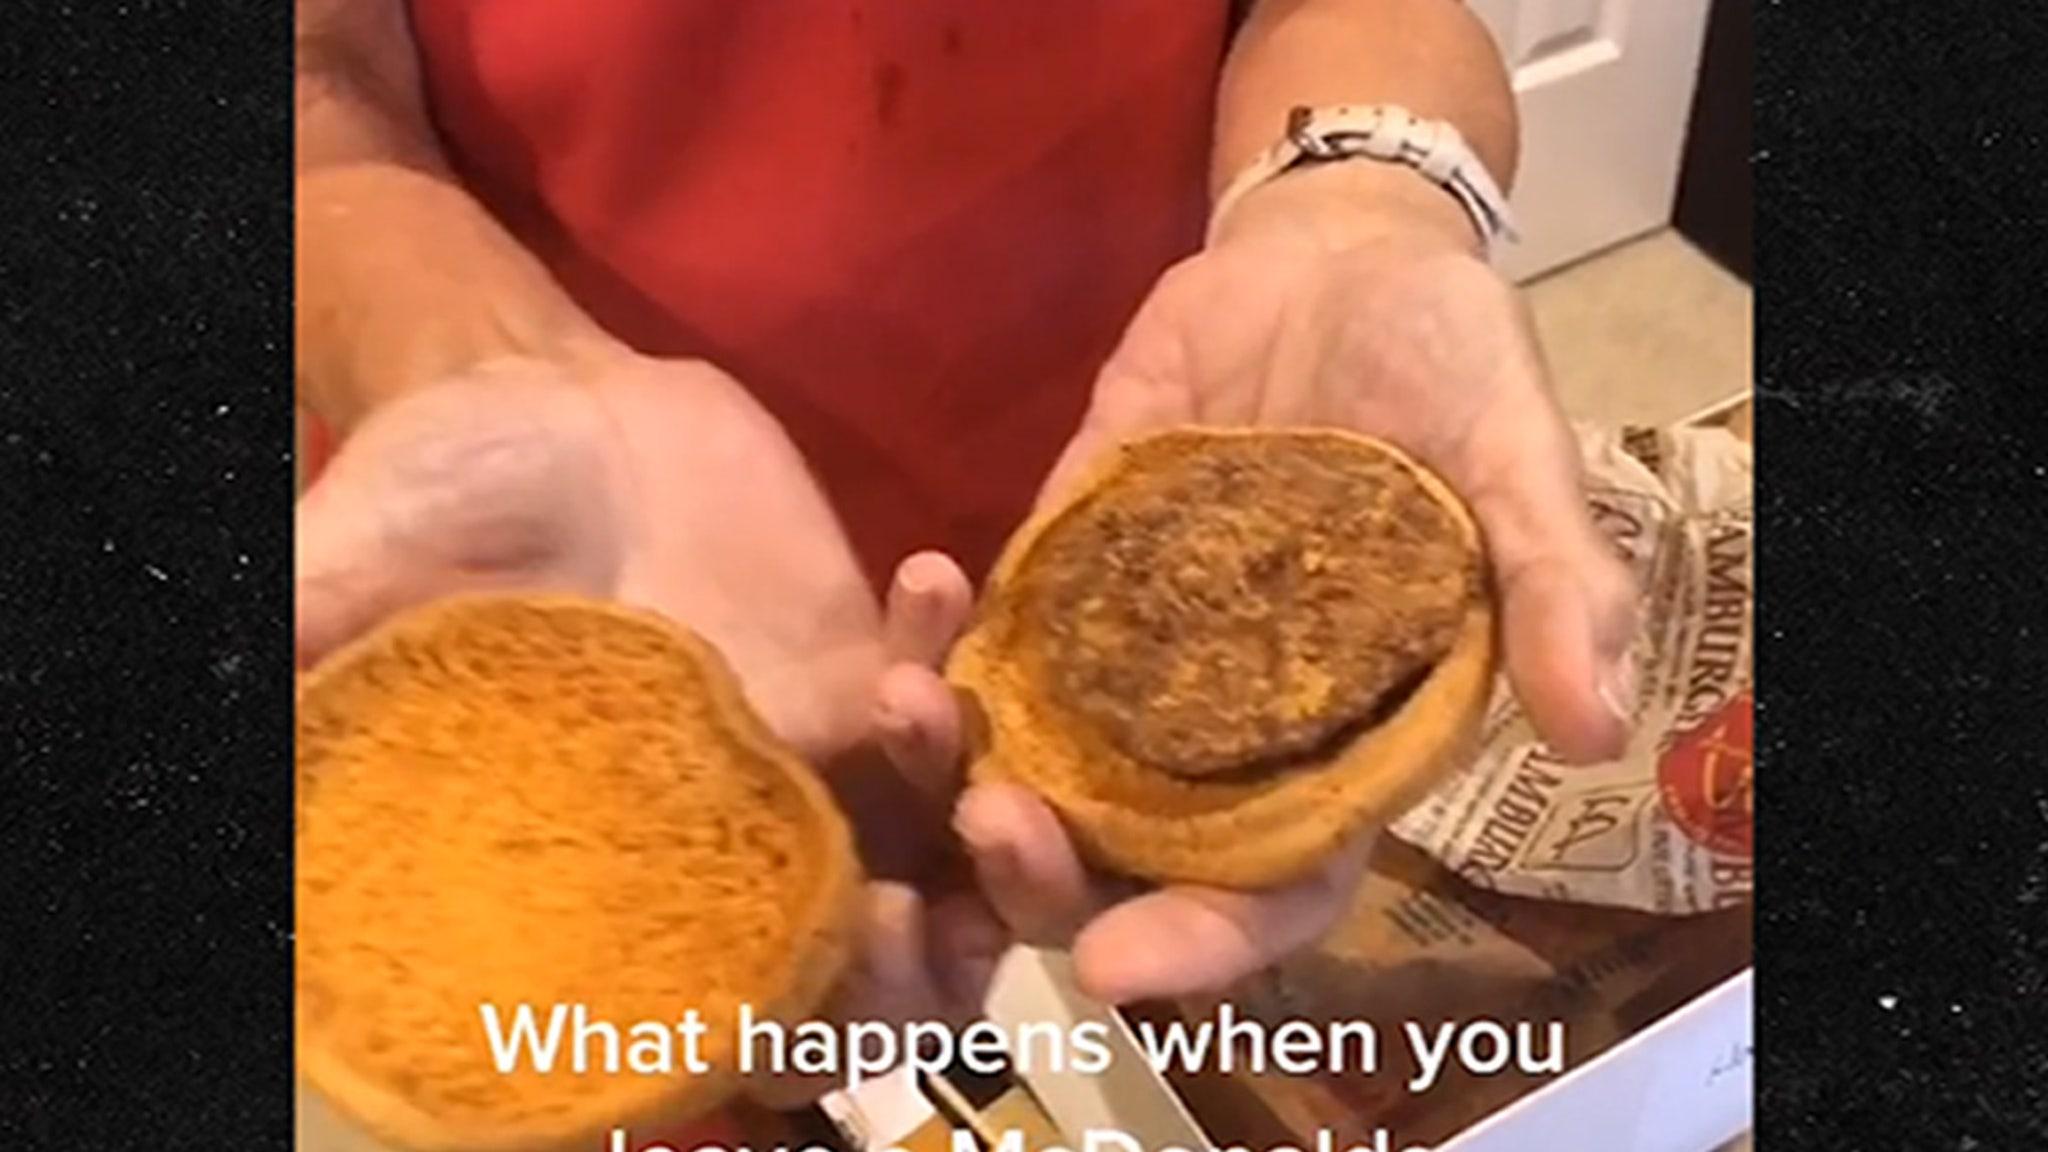 24 Year Old Mcdonald S Hamburger Still Looks Fresh